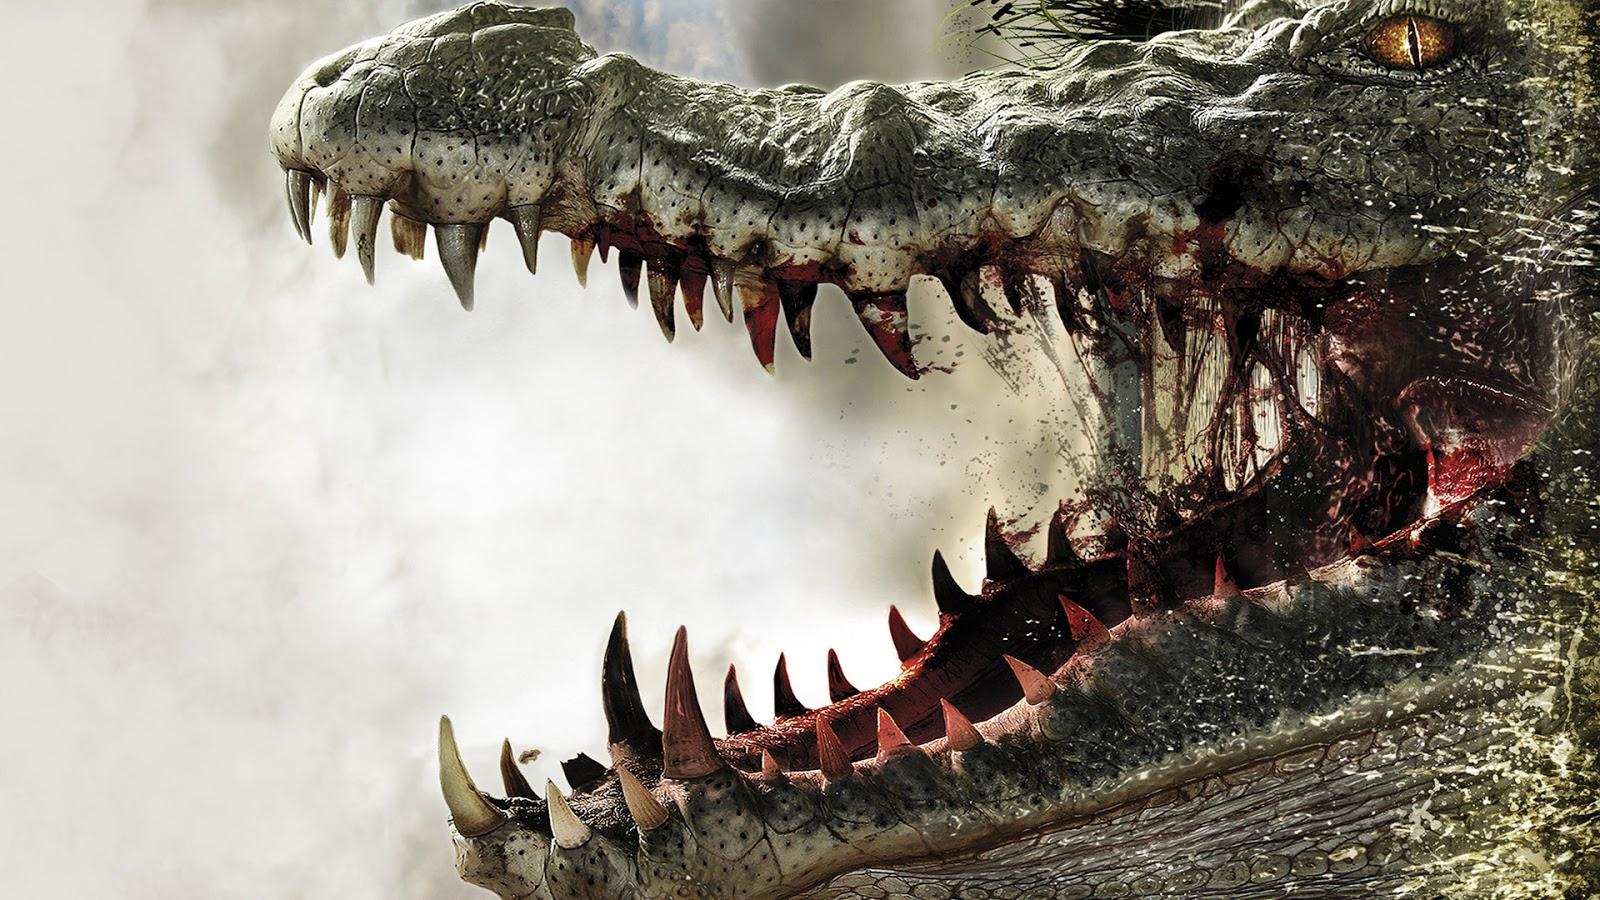 WildLife: Alligator new HD Wallpapers 2012